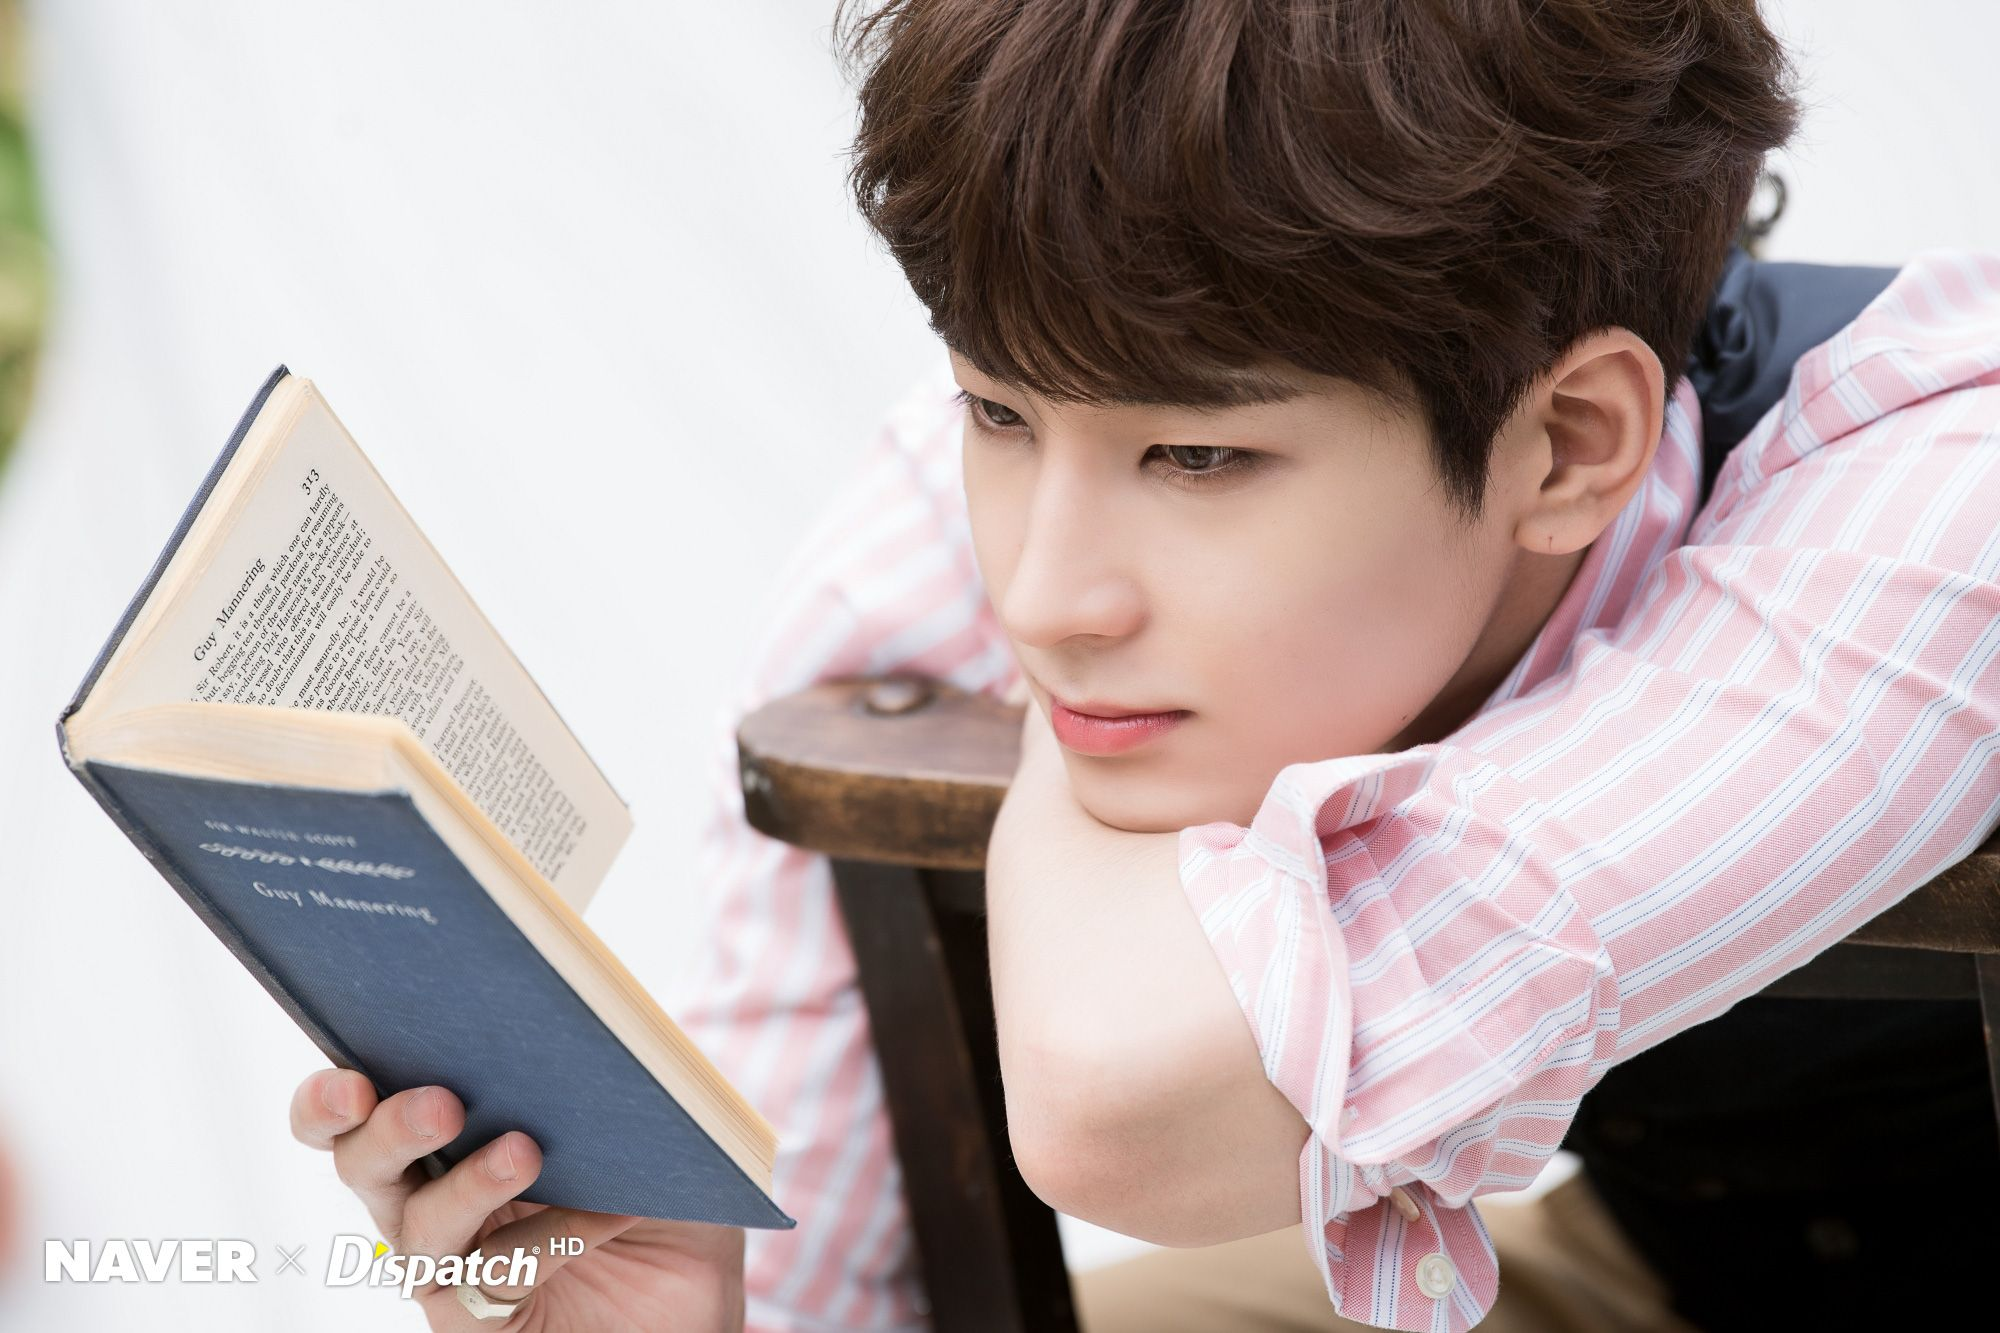 Jeon Wonwoo Image #230023 - Asiachan KPOP Image Board